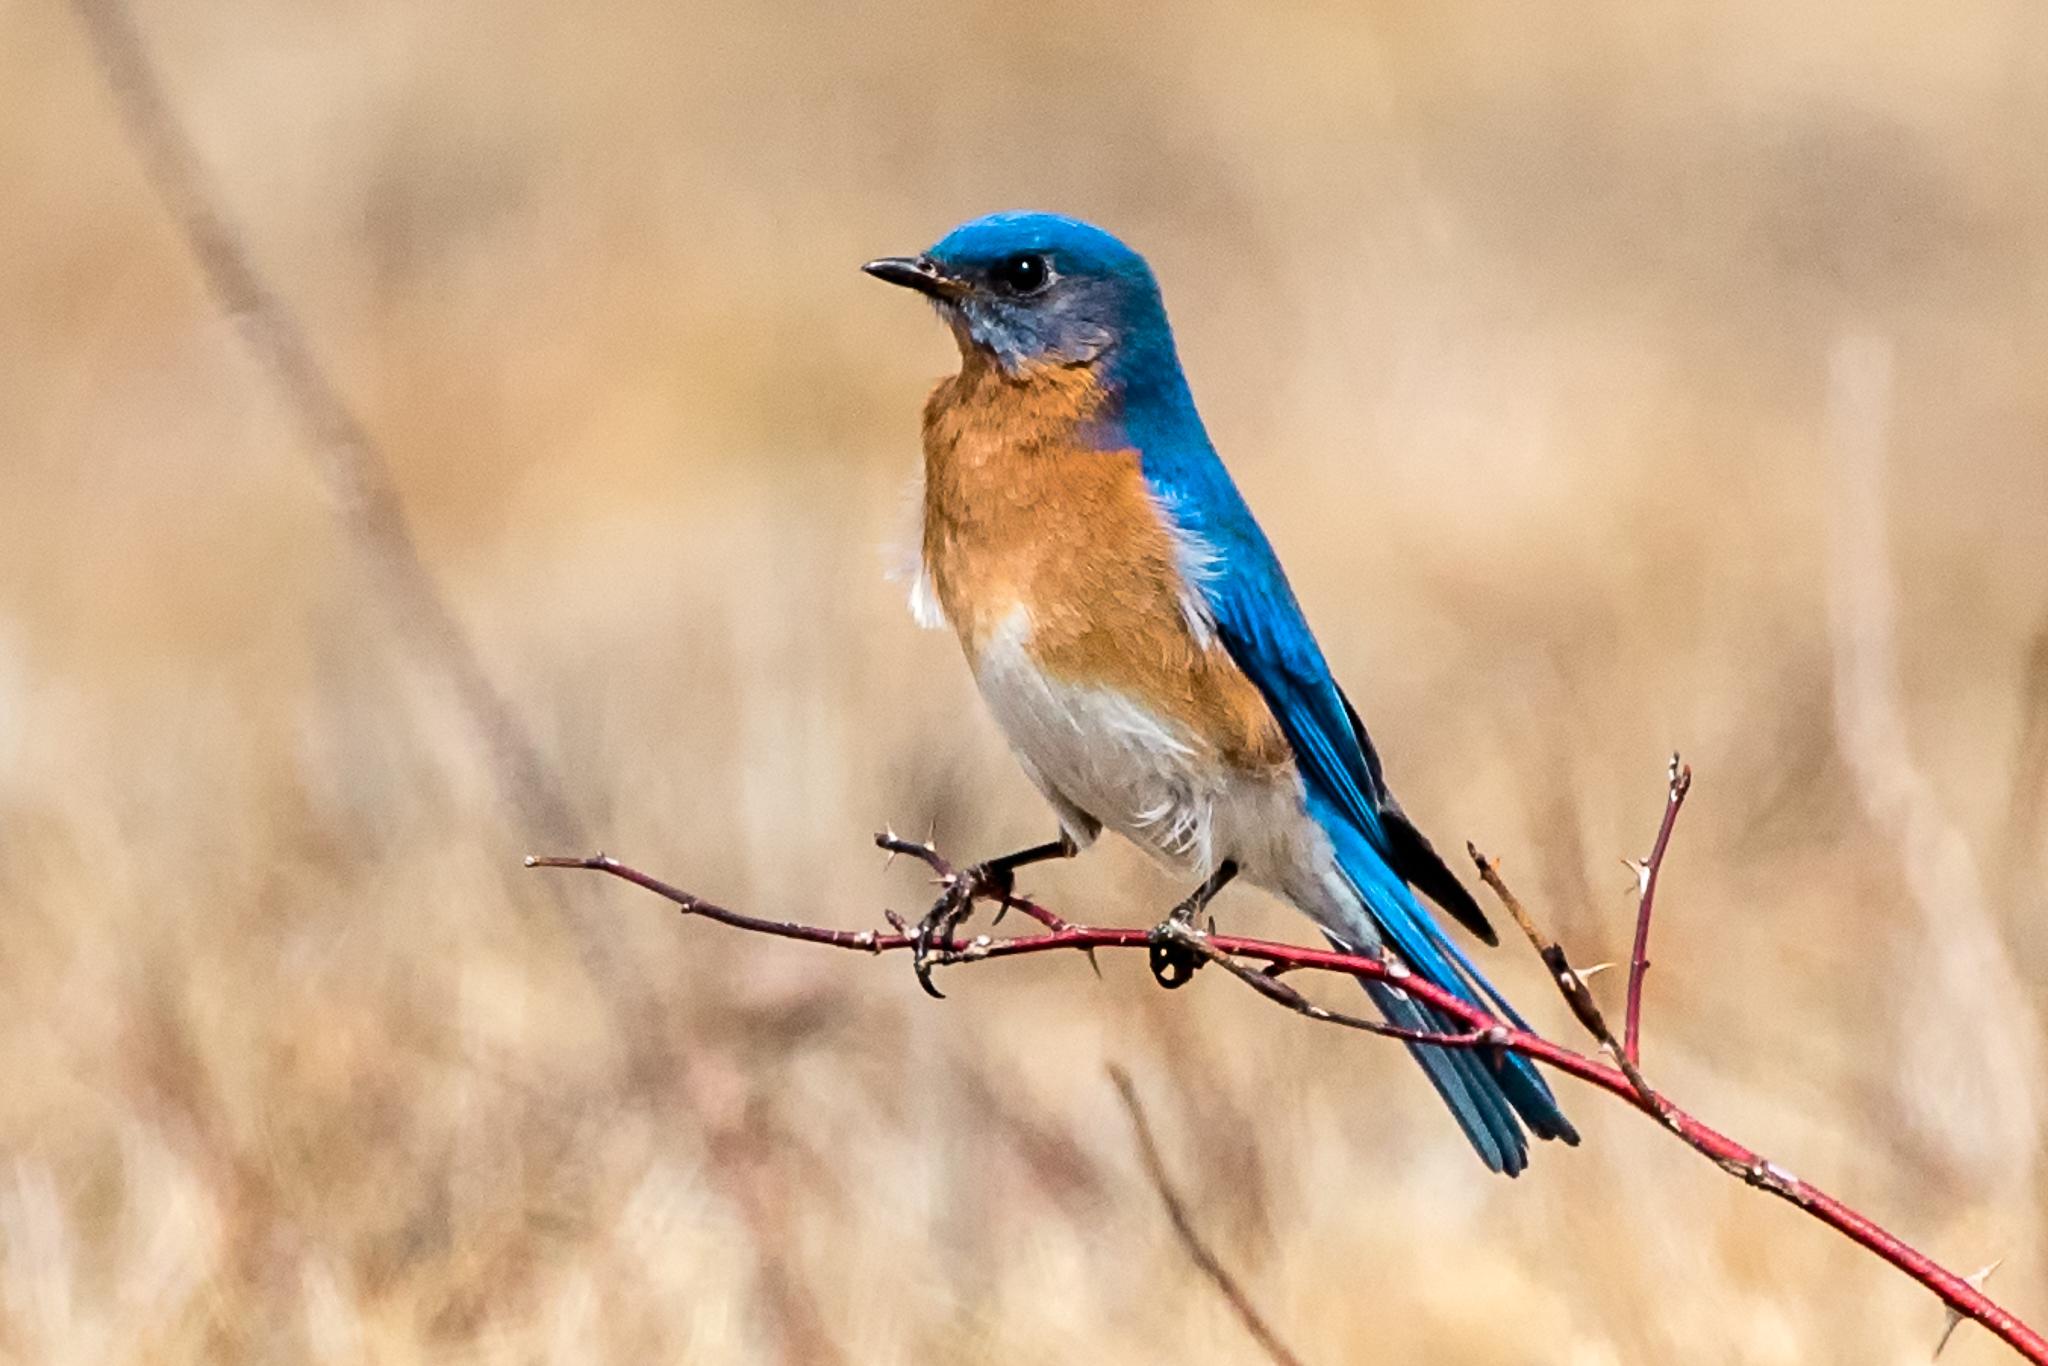 Eastern Bluebird Laudholm Farm 04-13-2017.jpg